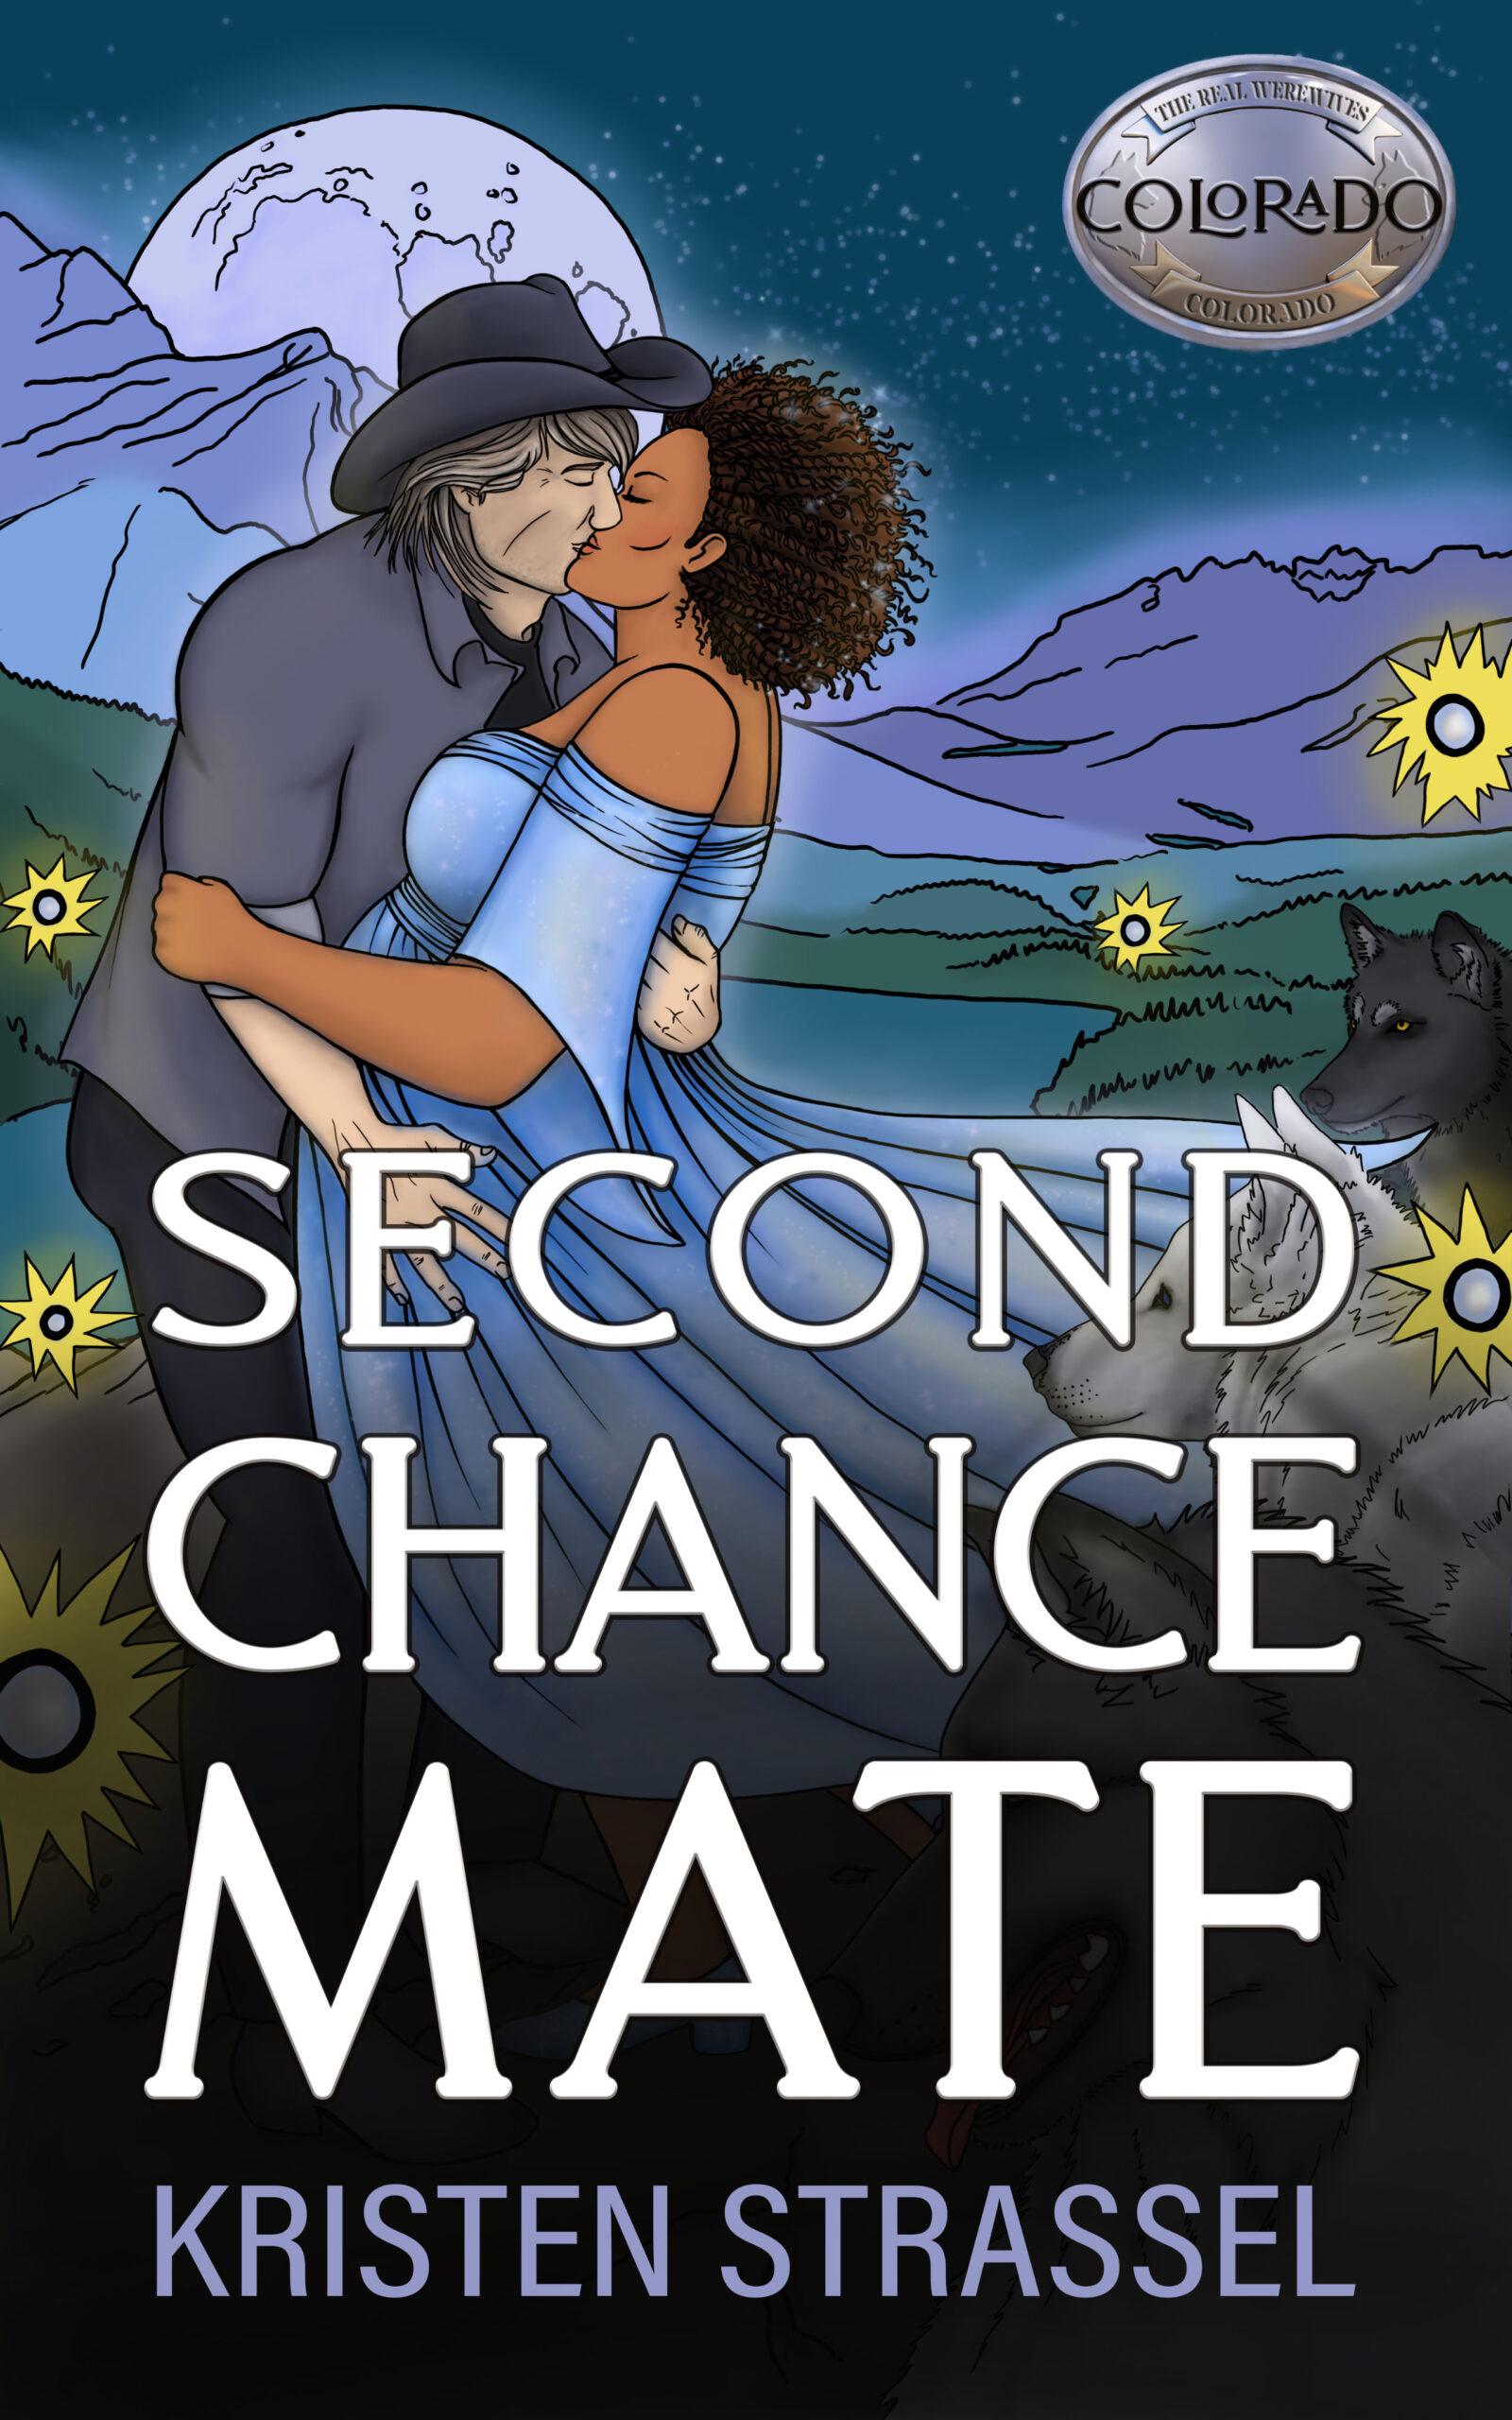 SecondChance_small